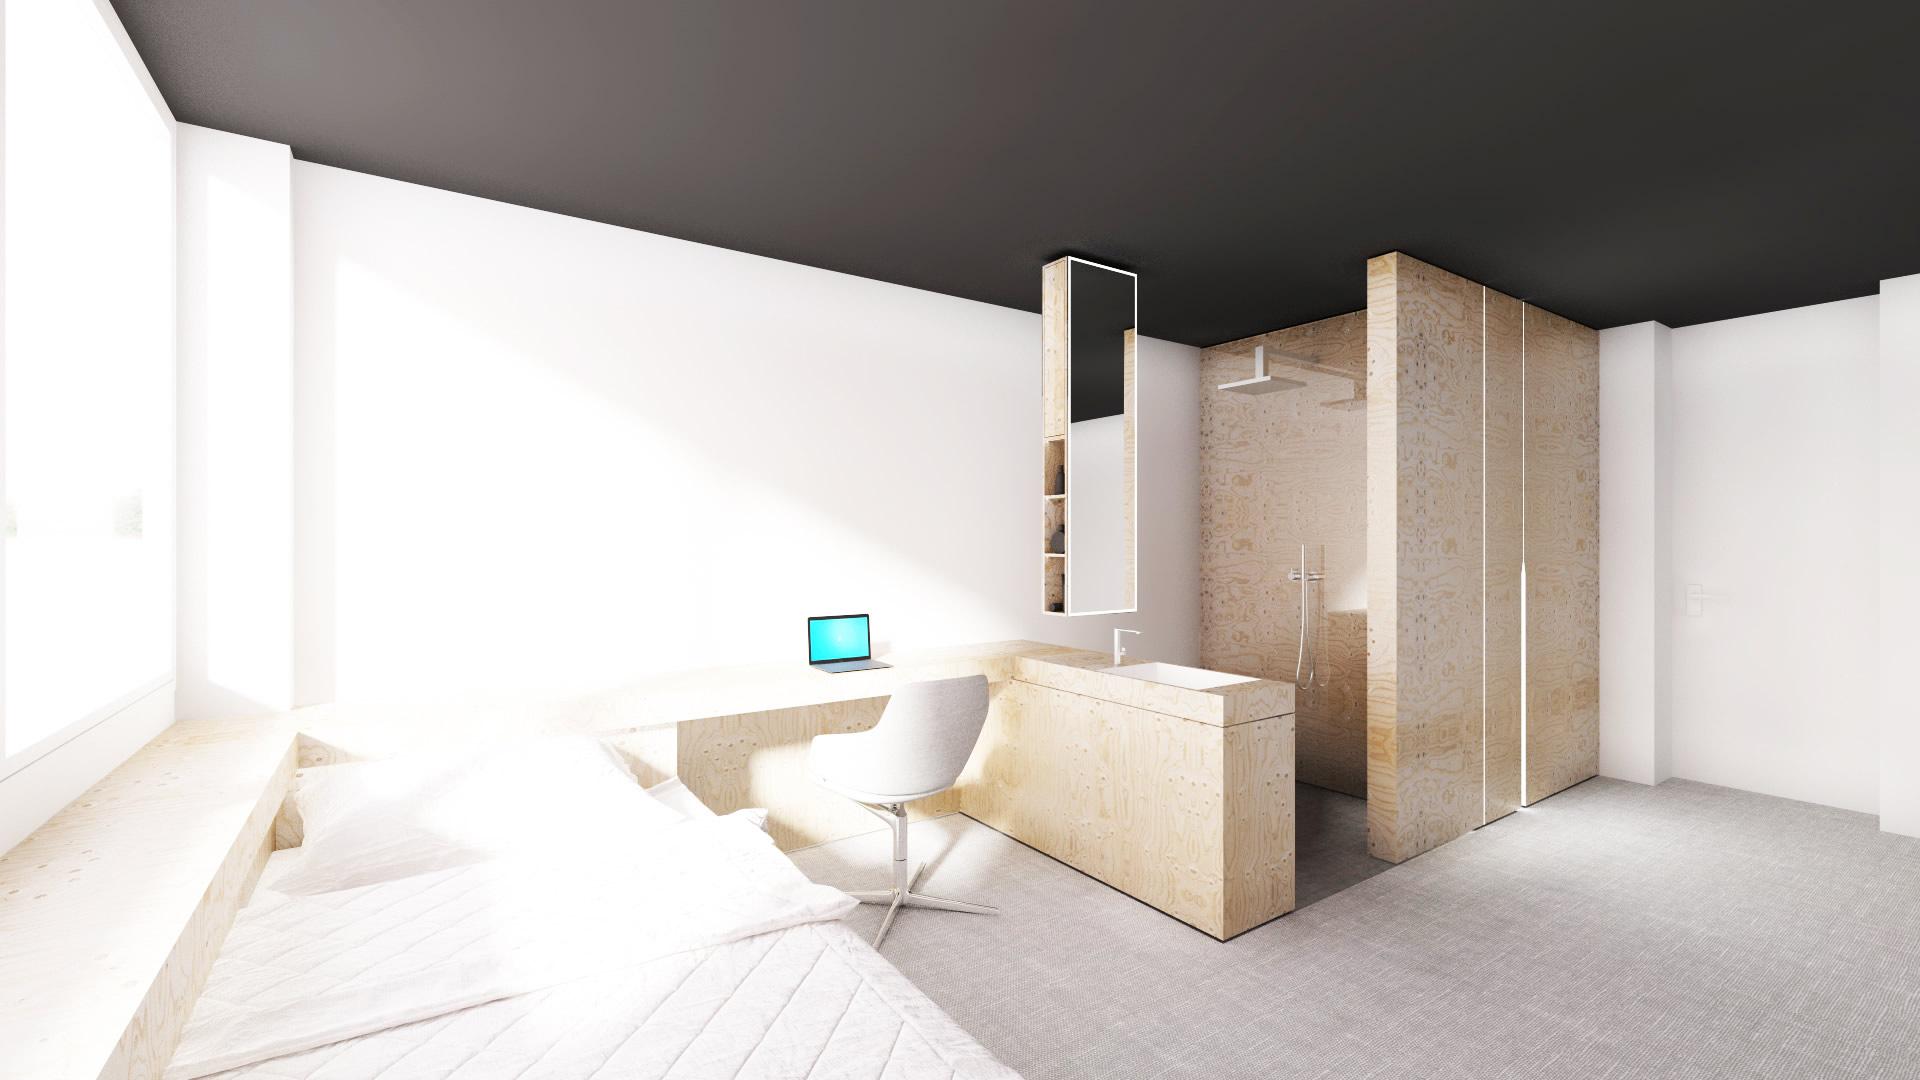 whocares_design_hotel_material-4